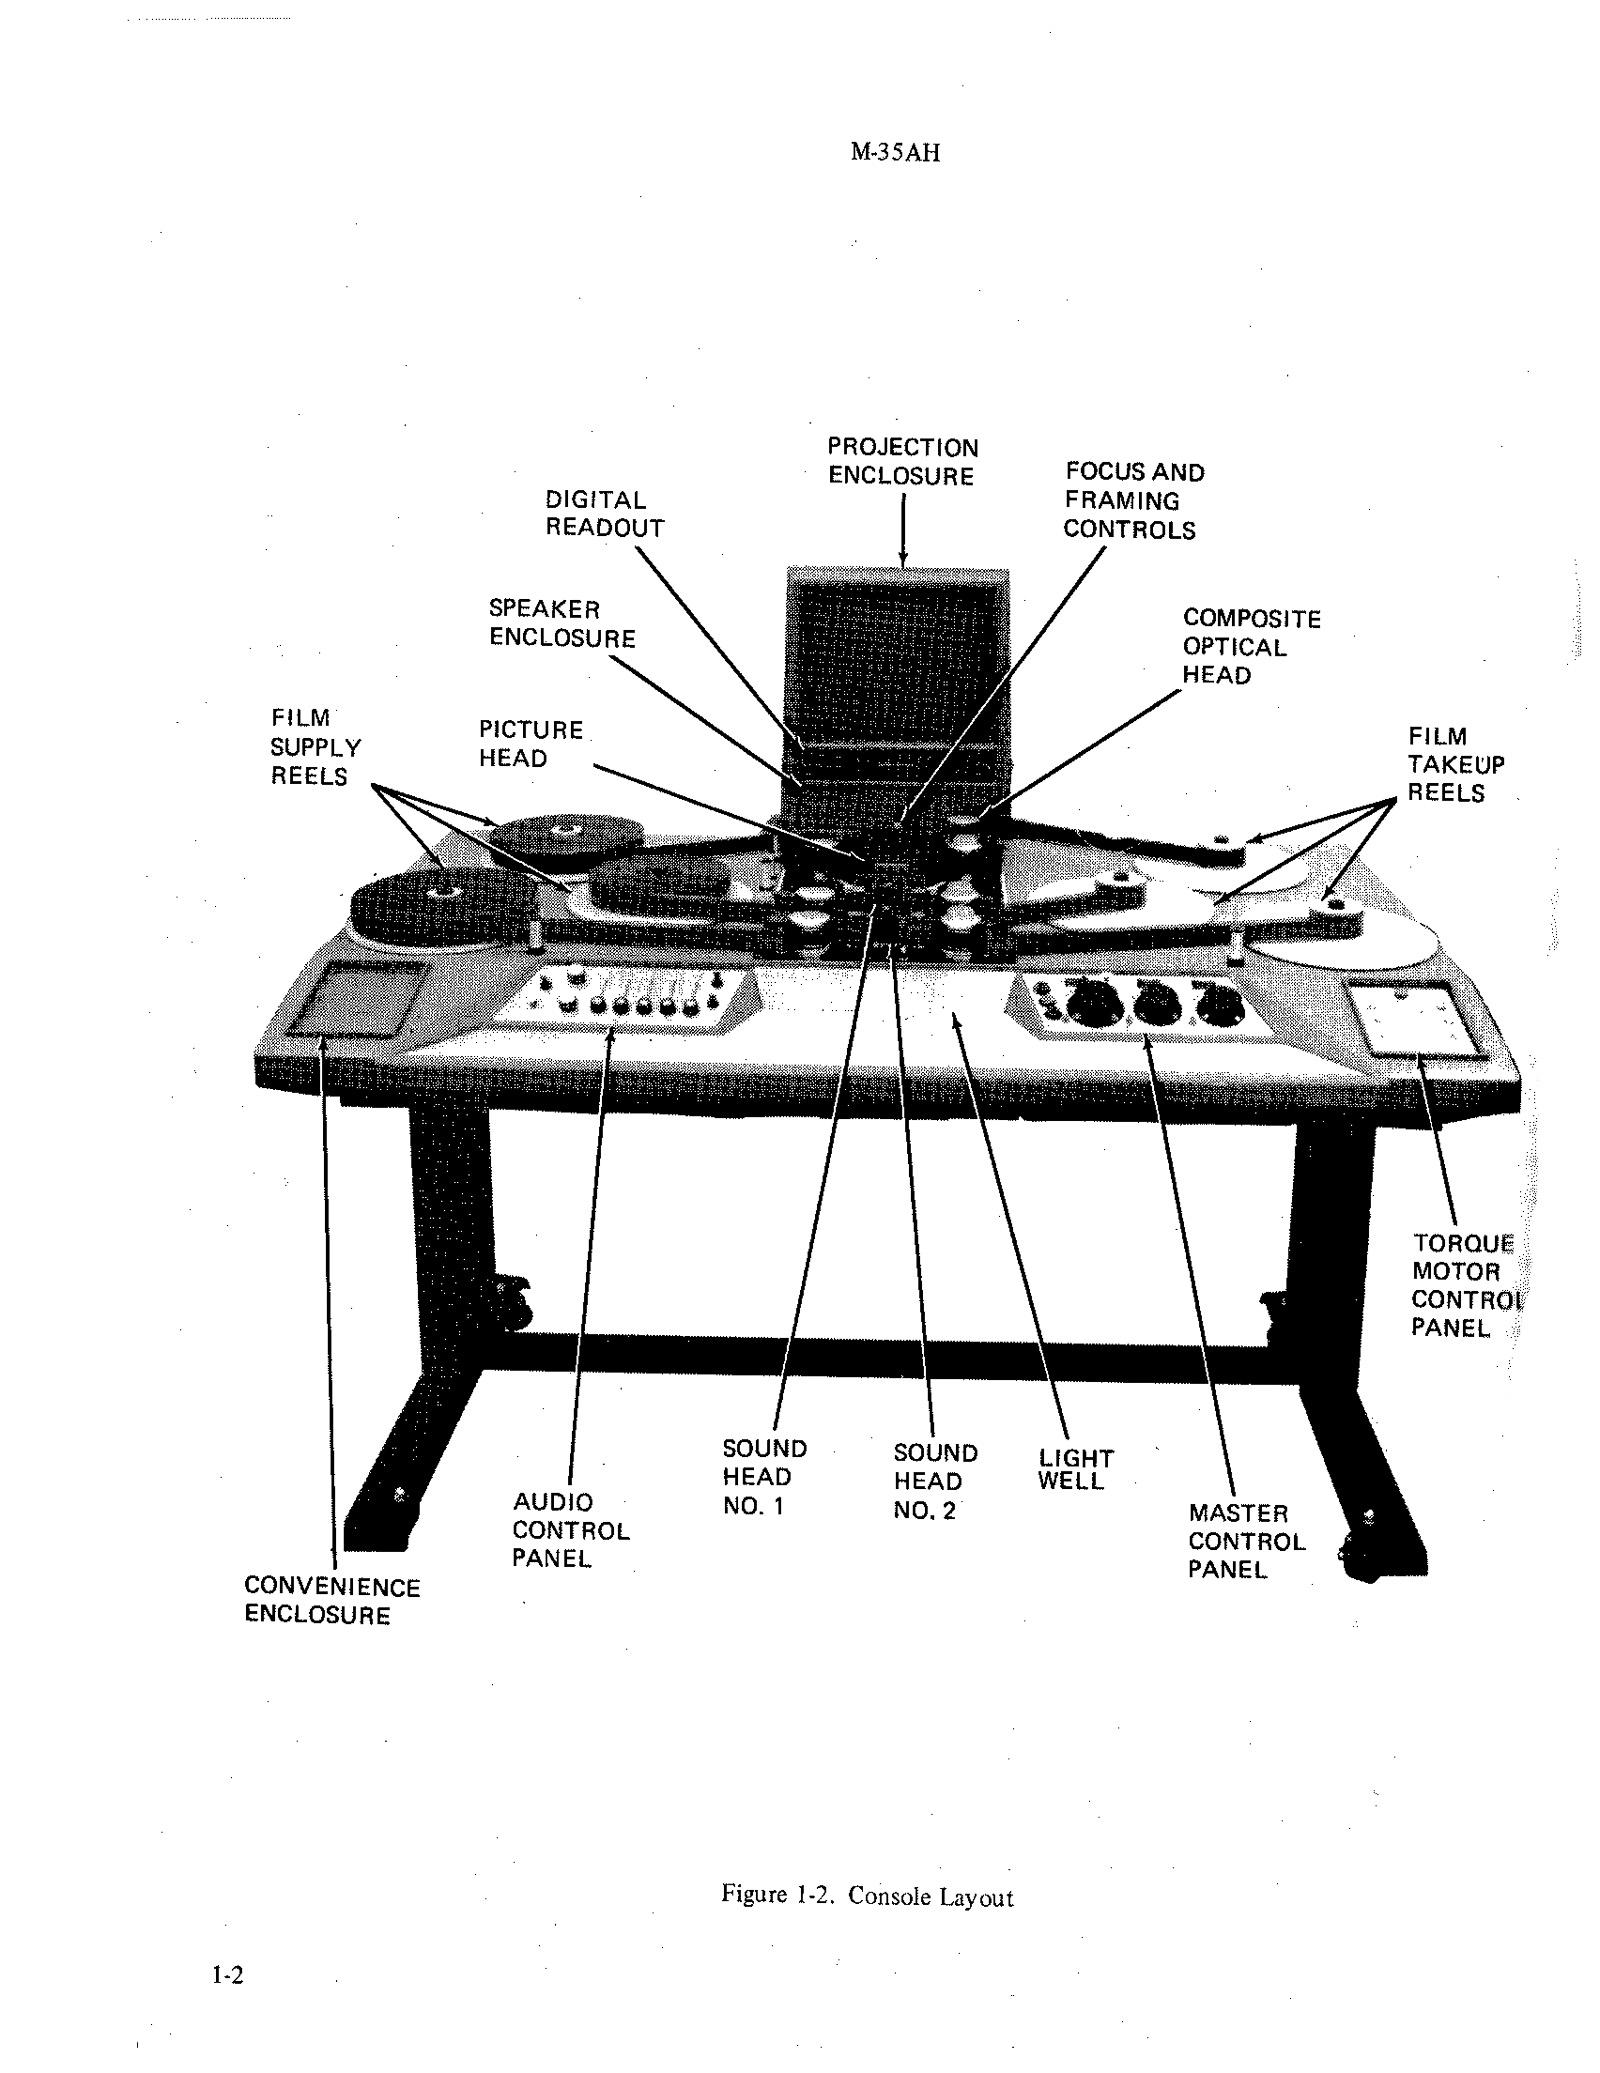 Moviola Six-Plate 35mm Flatbed Console Editor M-35AH